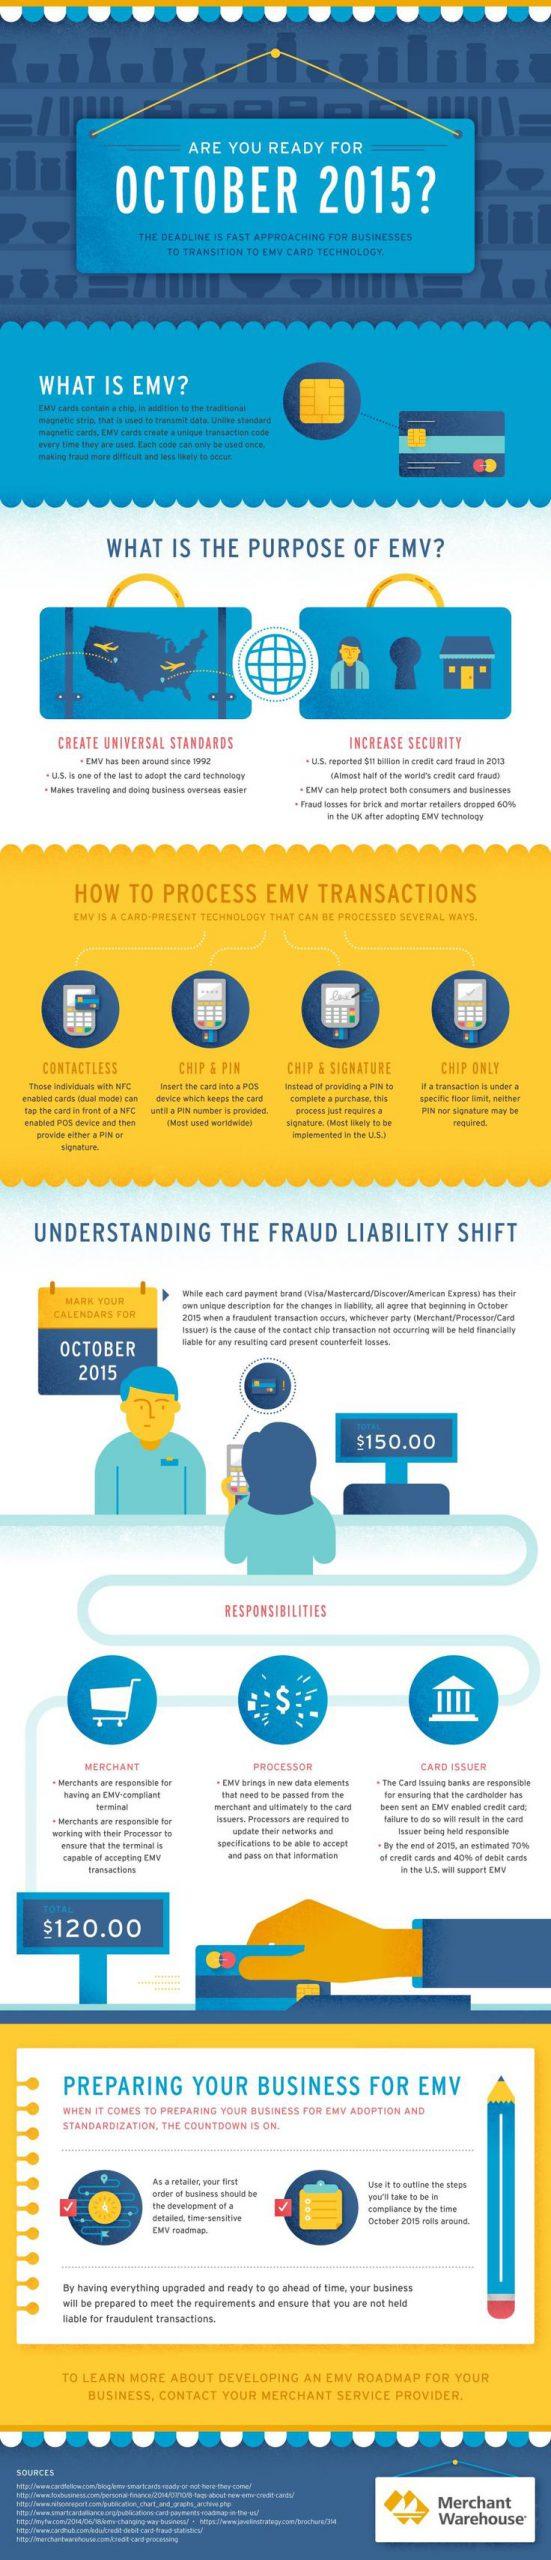 octobre 2015- transmision to EMV card technology